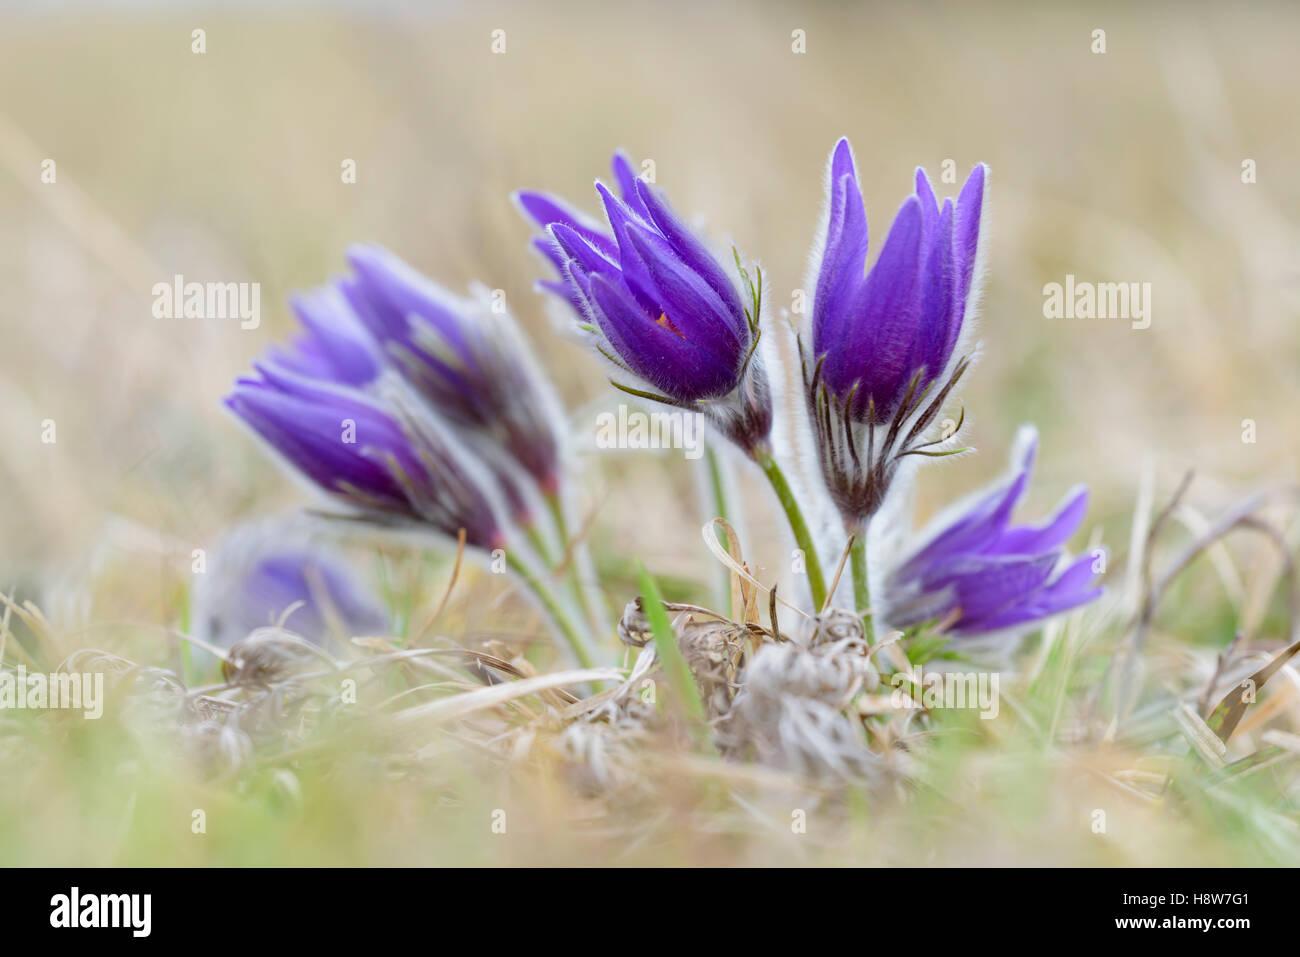 Gewoehnliche Kuechenschellen, Pulsatilla vulgaris, Pasque flower - Stock Image